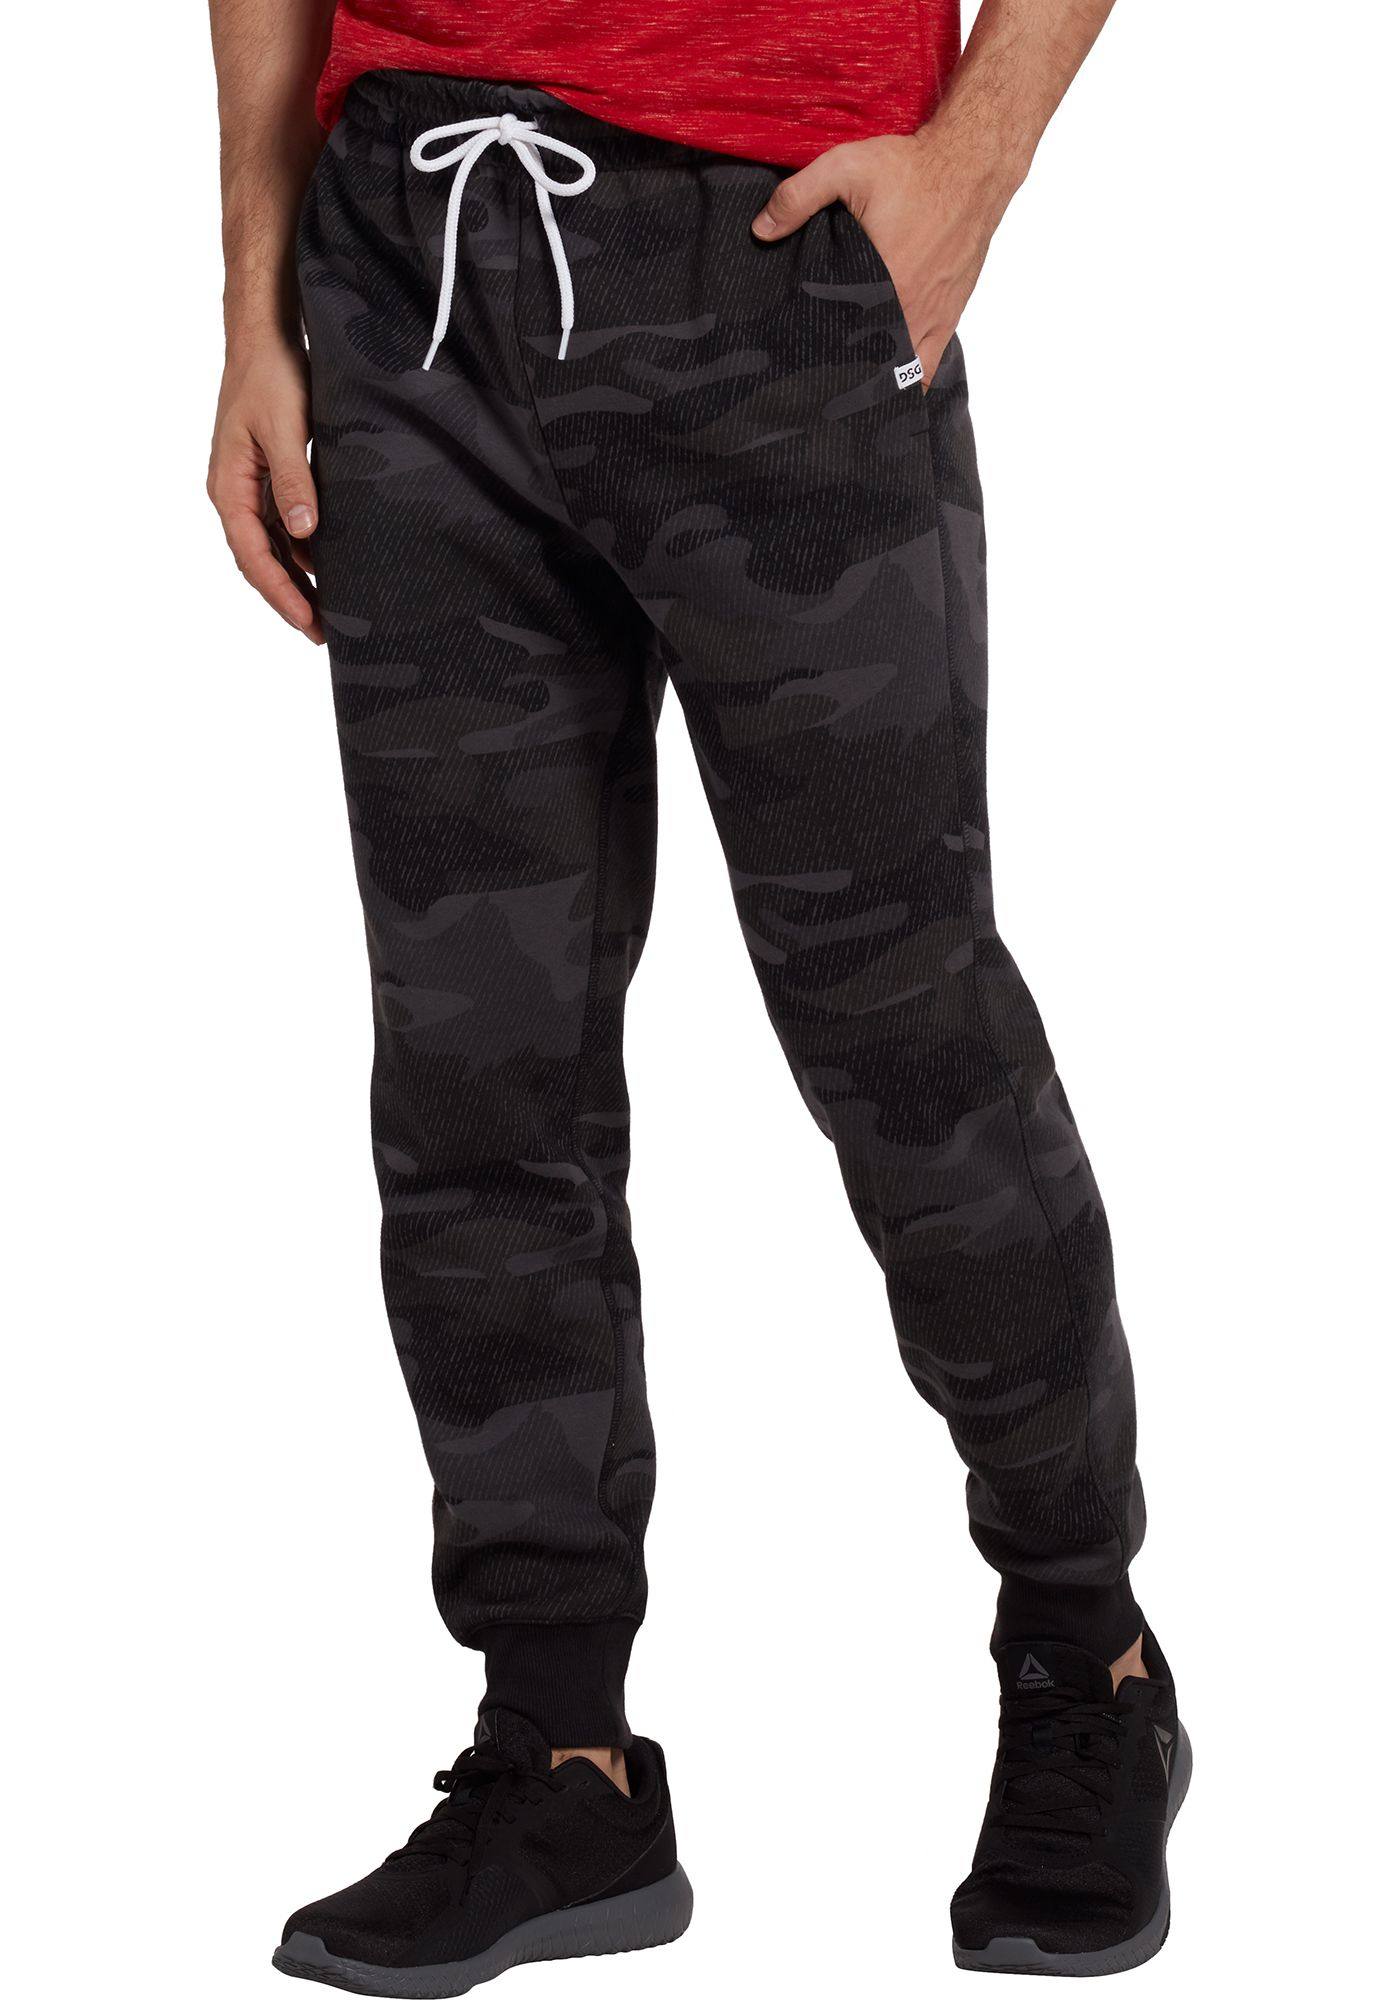 DSG Men's Everyday Cotton Fleece Jogger Pants